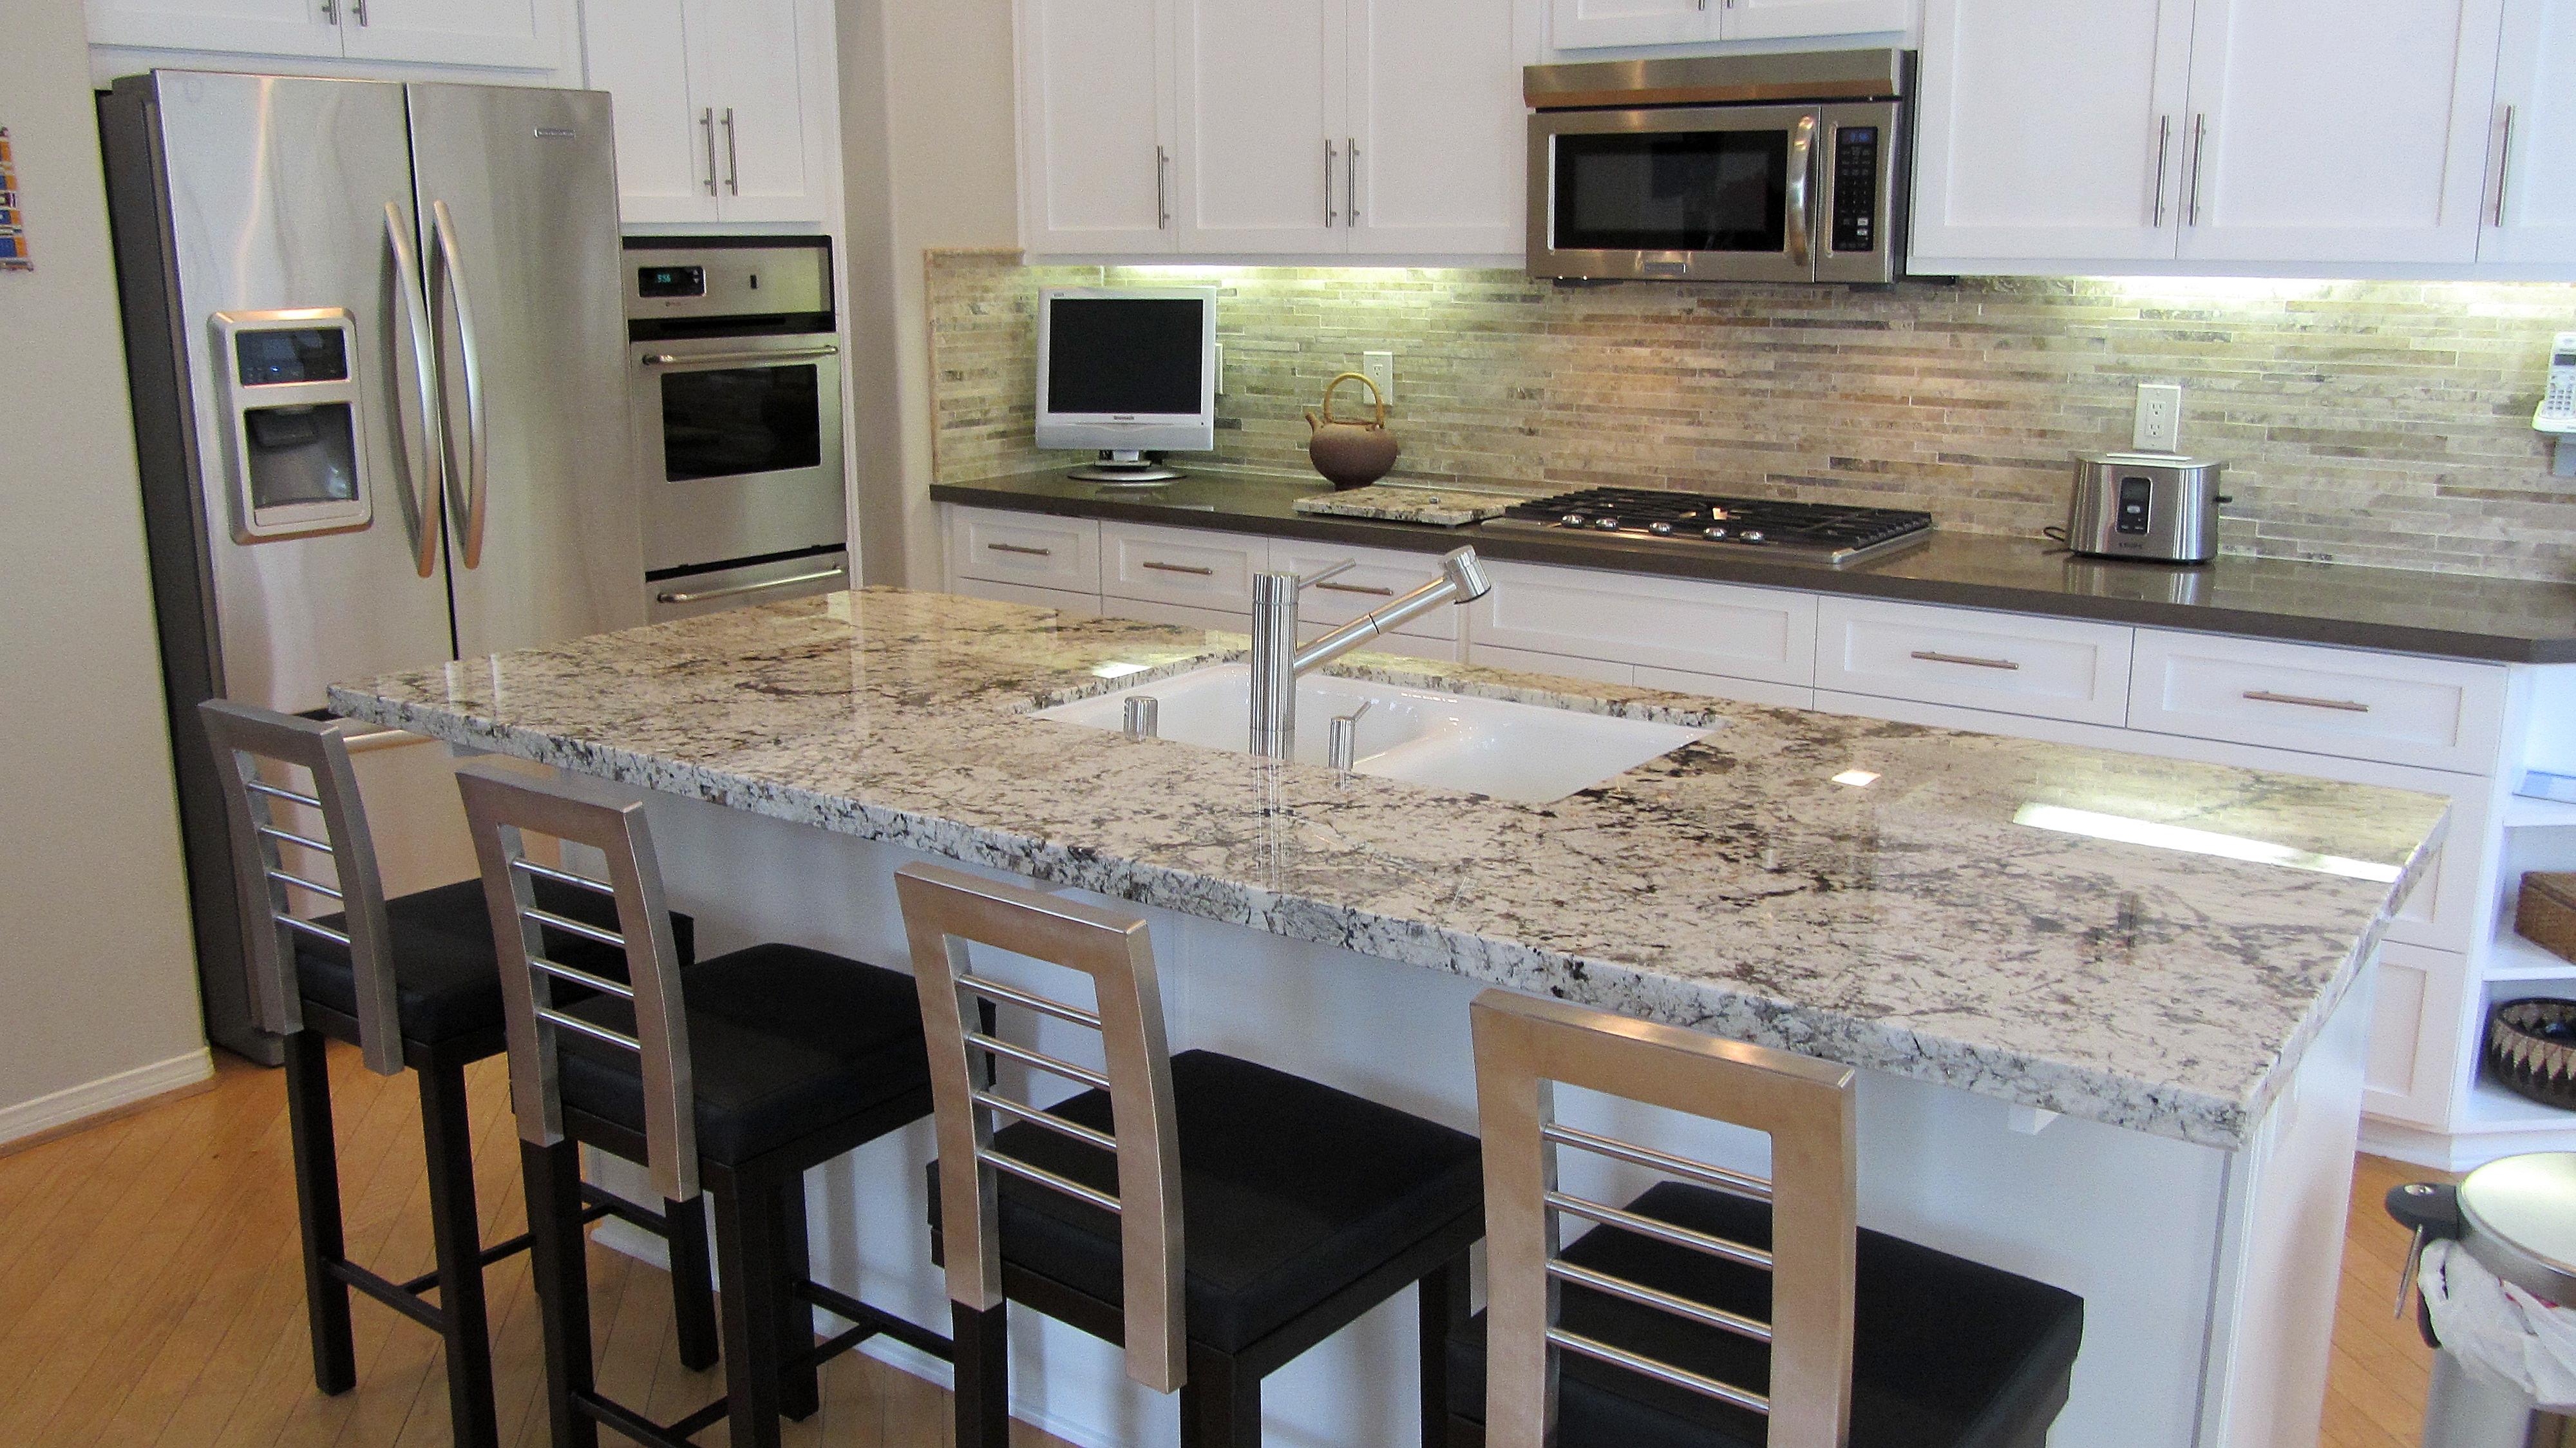 diamond cabinet refacing inc in riverside ca 951 977 8 diamo